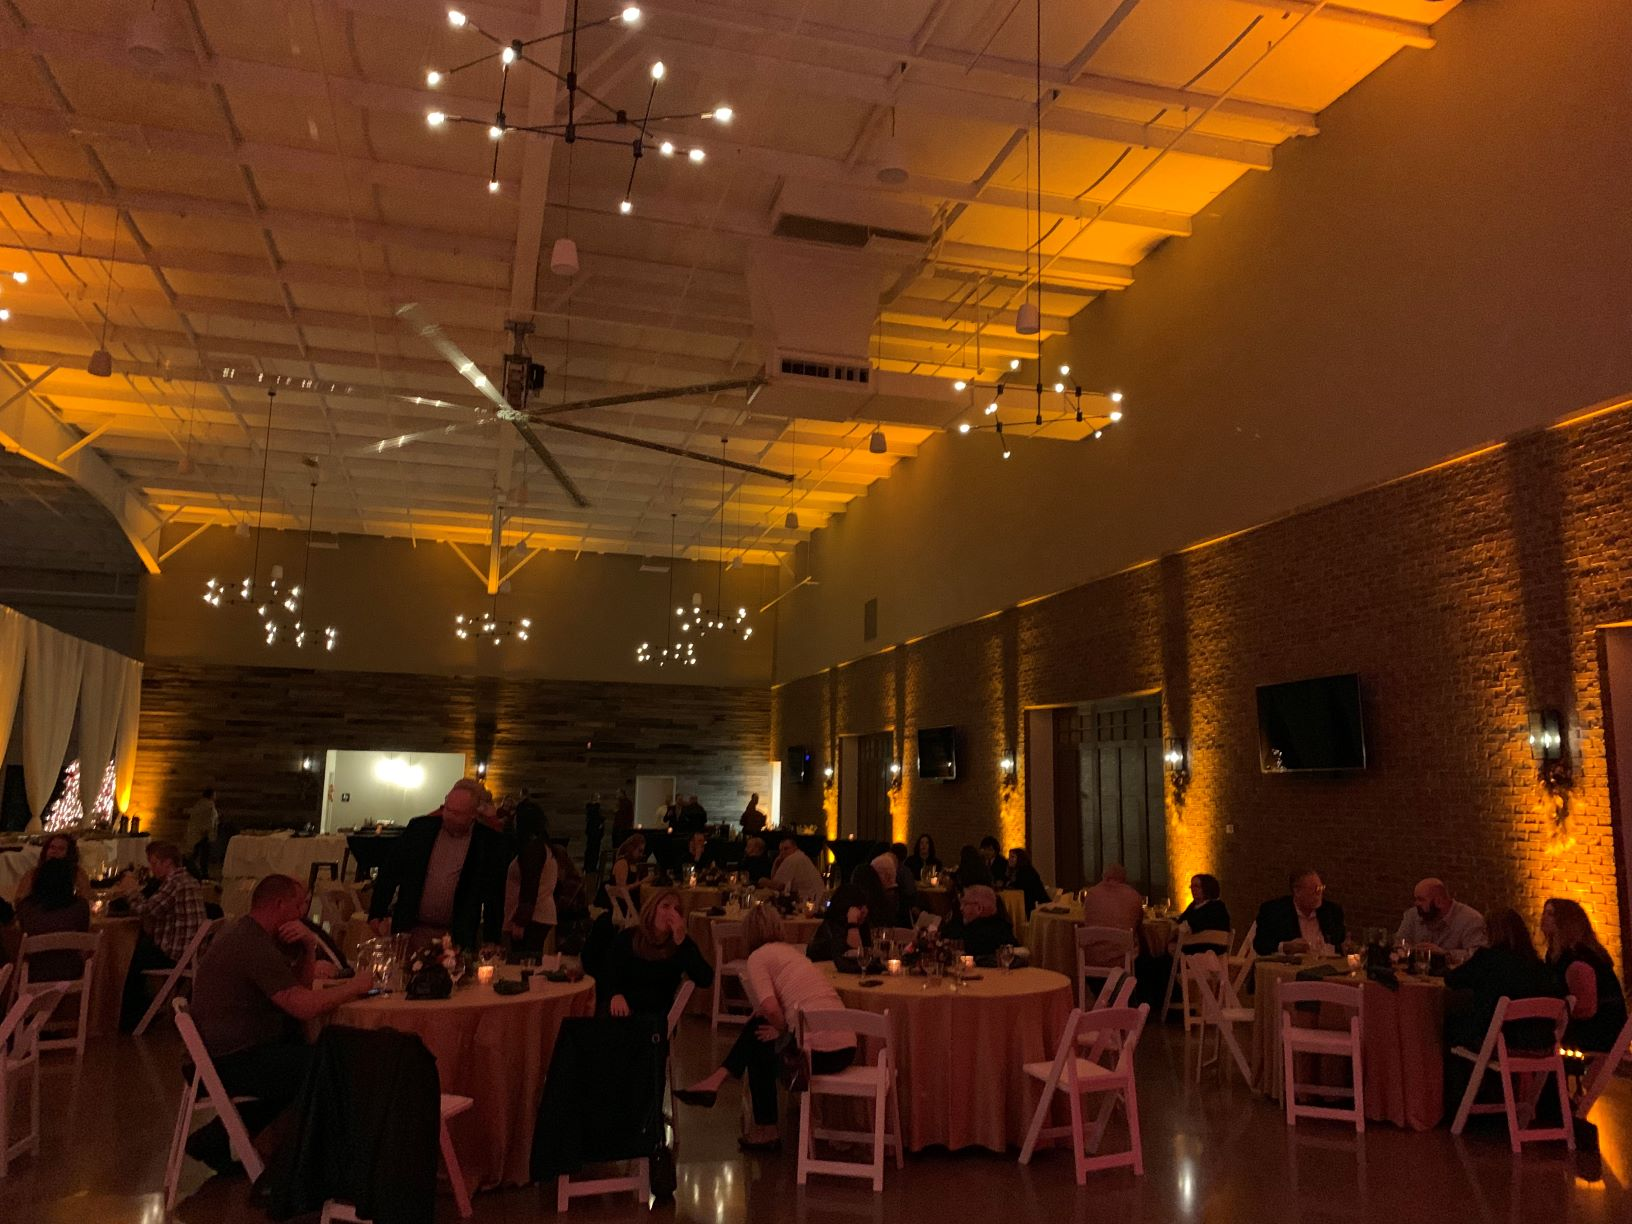 Elkhart Center 615 Candlelight Yellow Uplighting